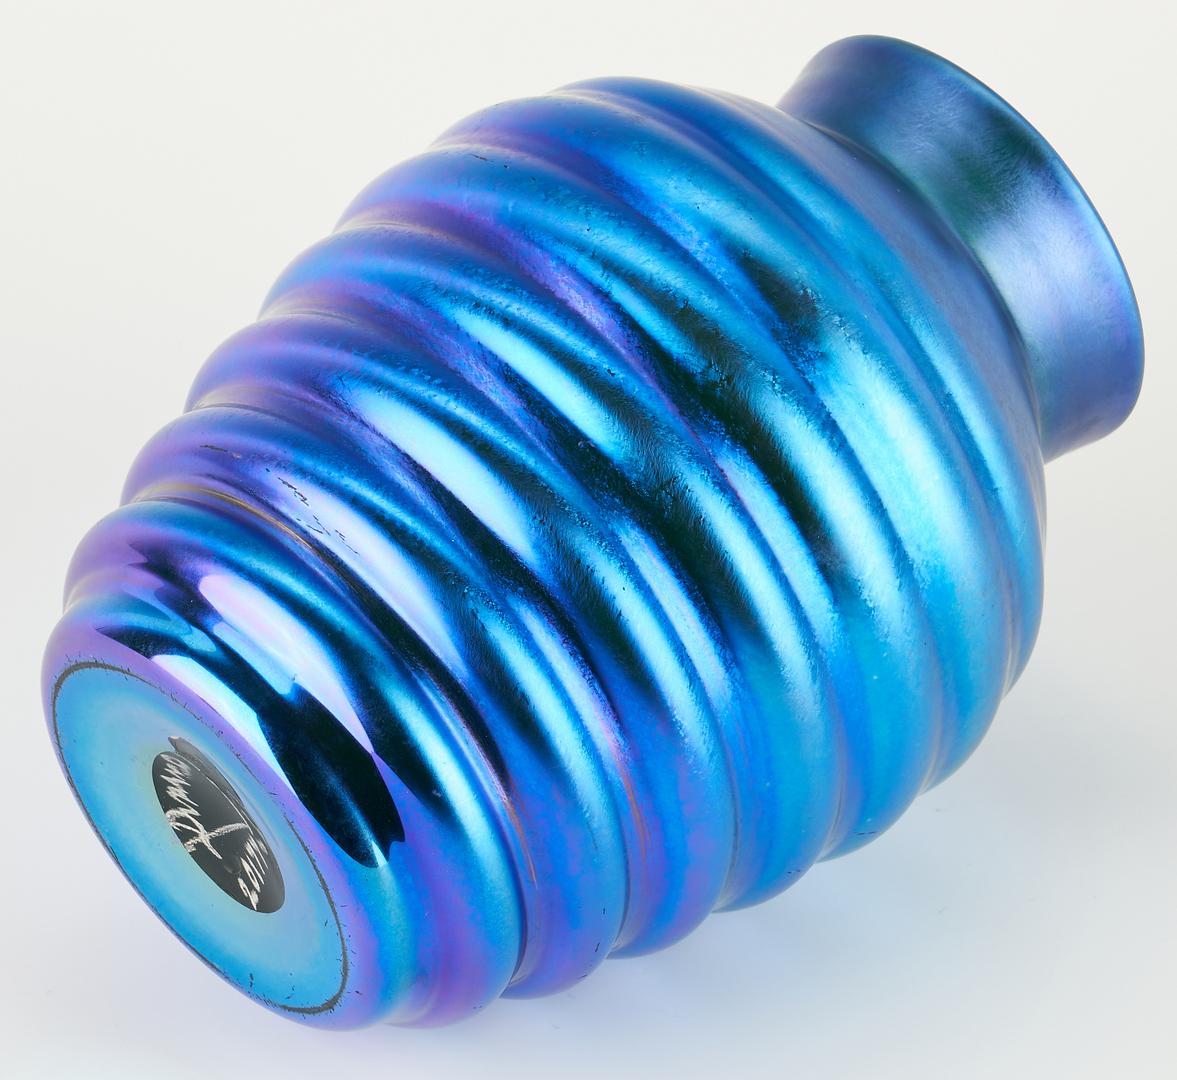 Lot 536: Durand Art Glass Beehive Vase